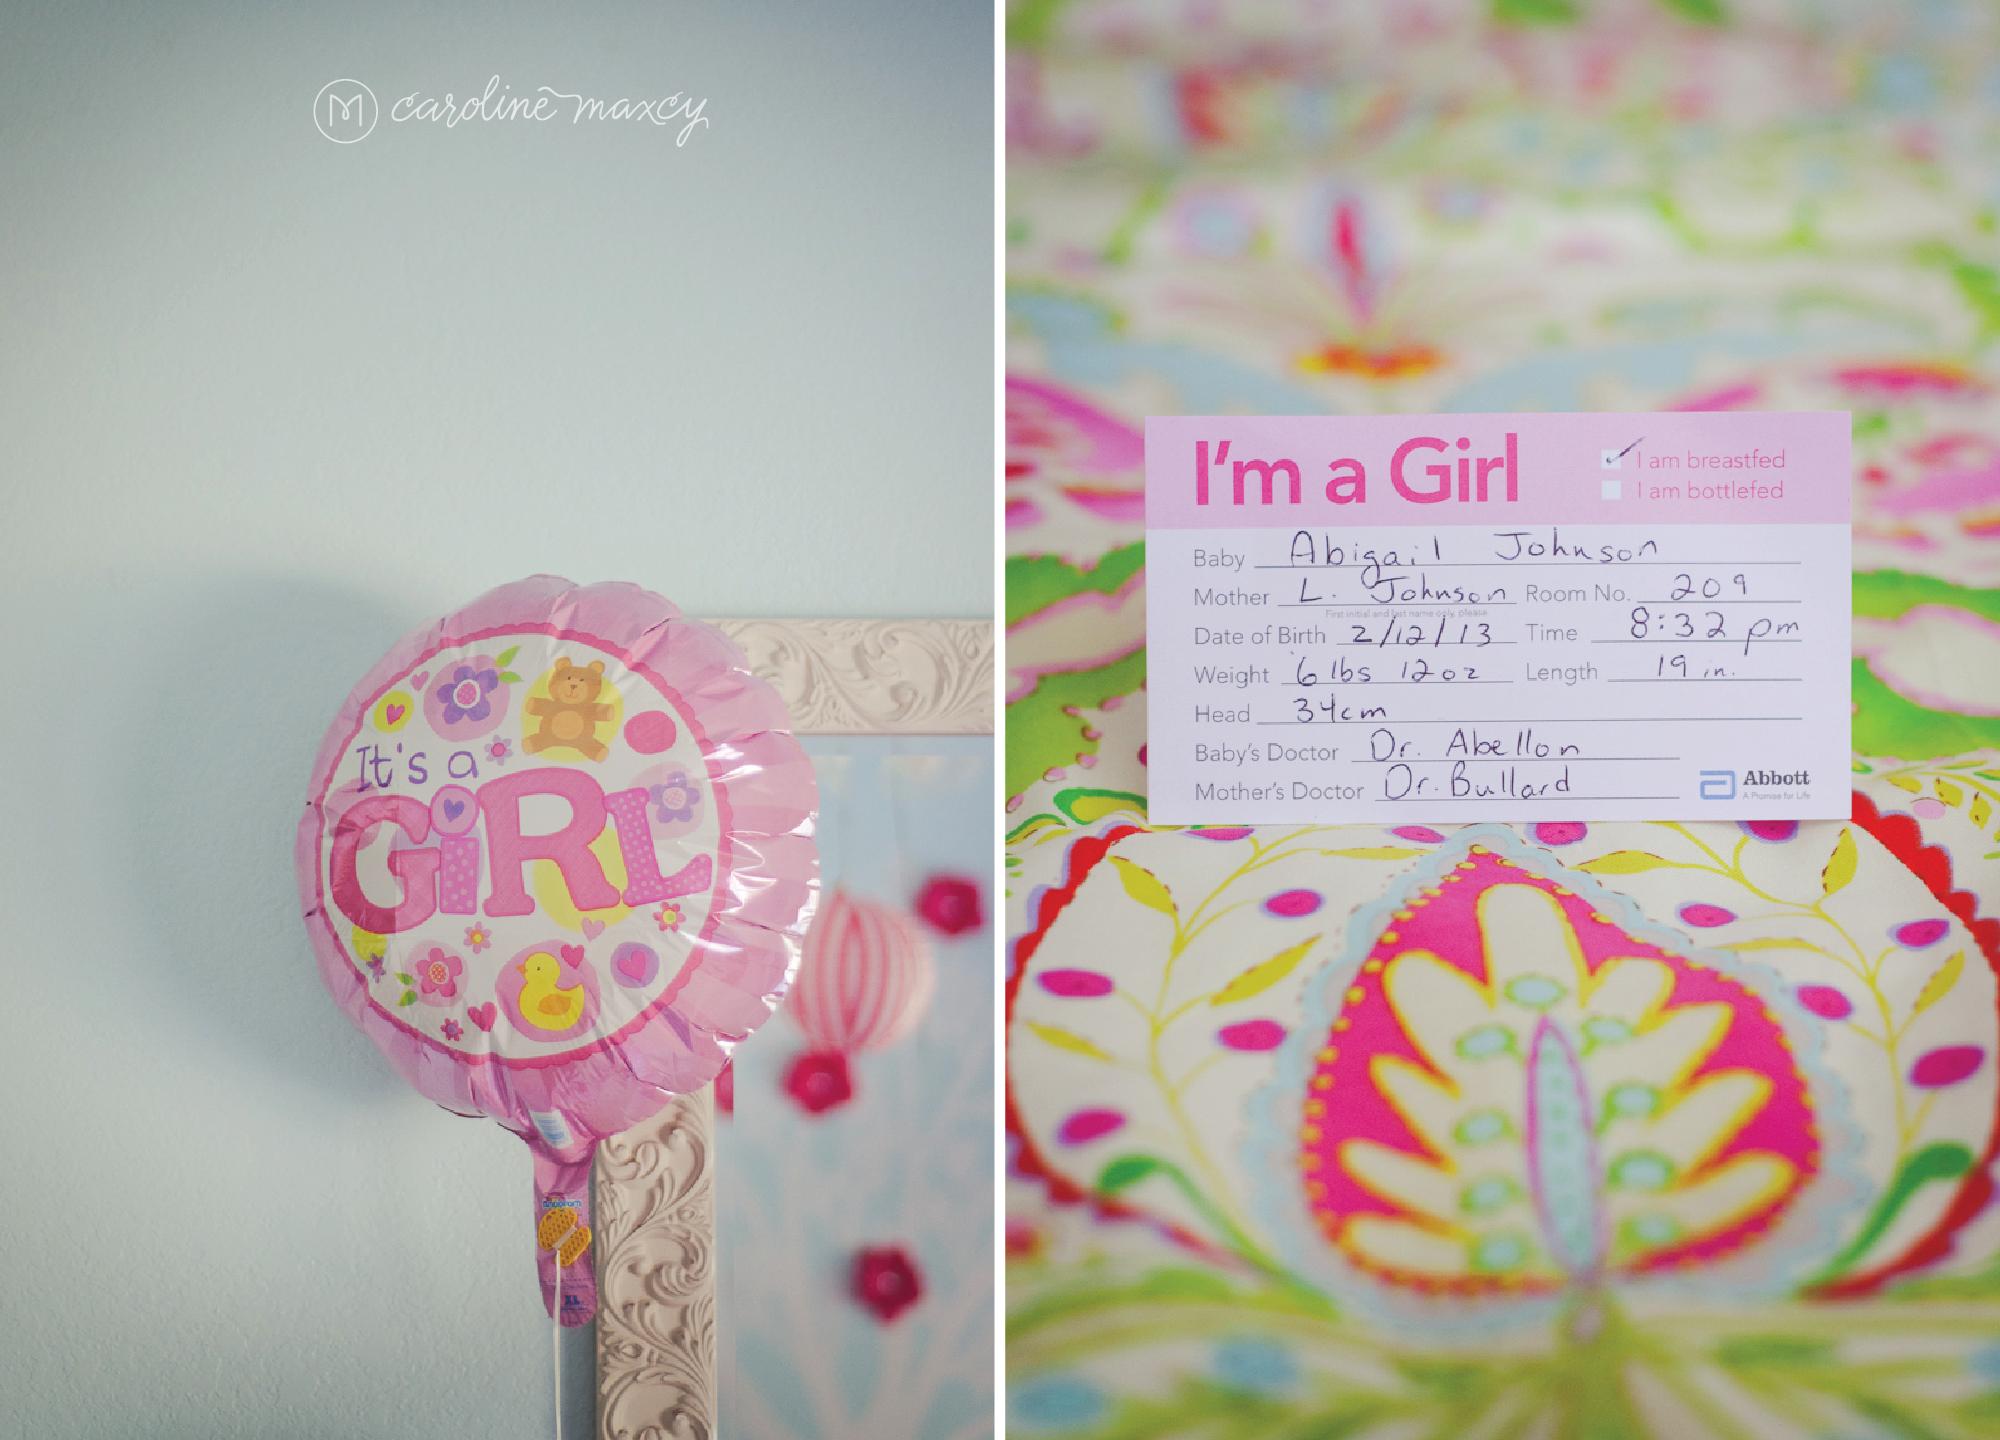 2013_04_16_BabyAbby_blog4.jpg